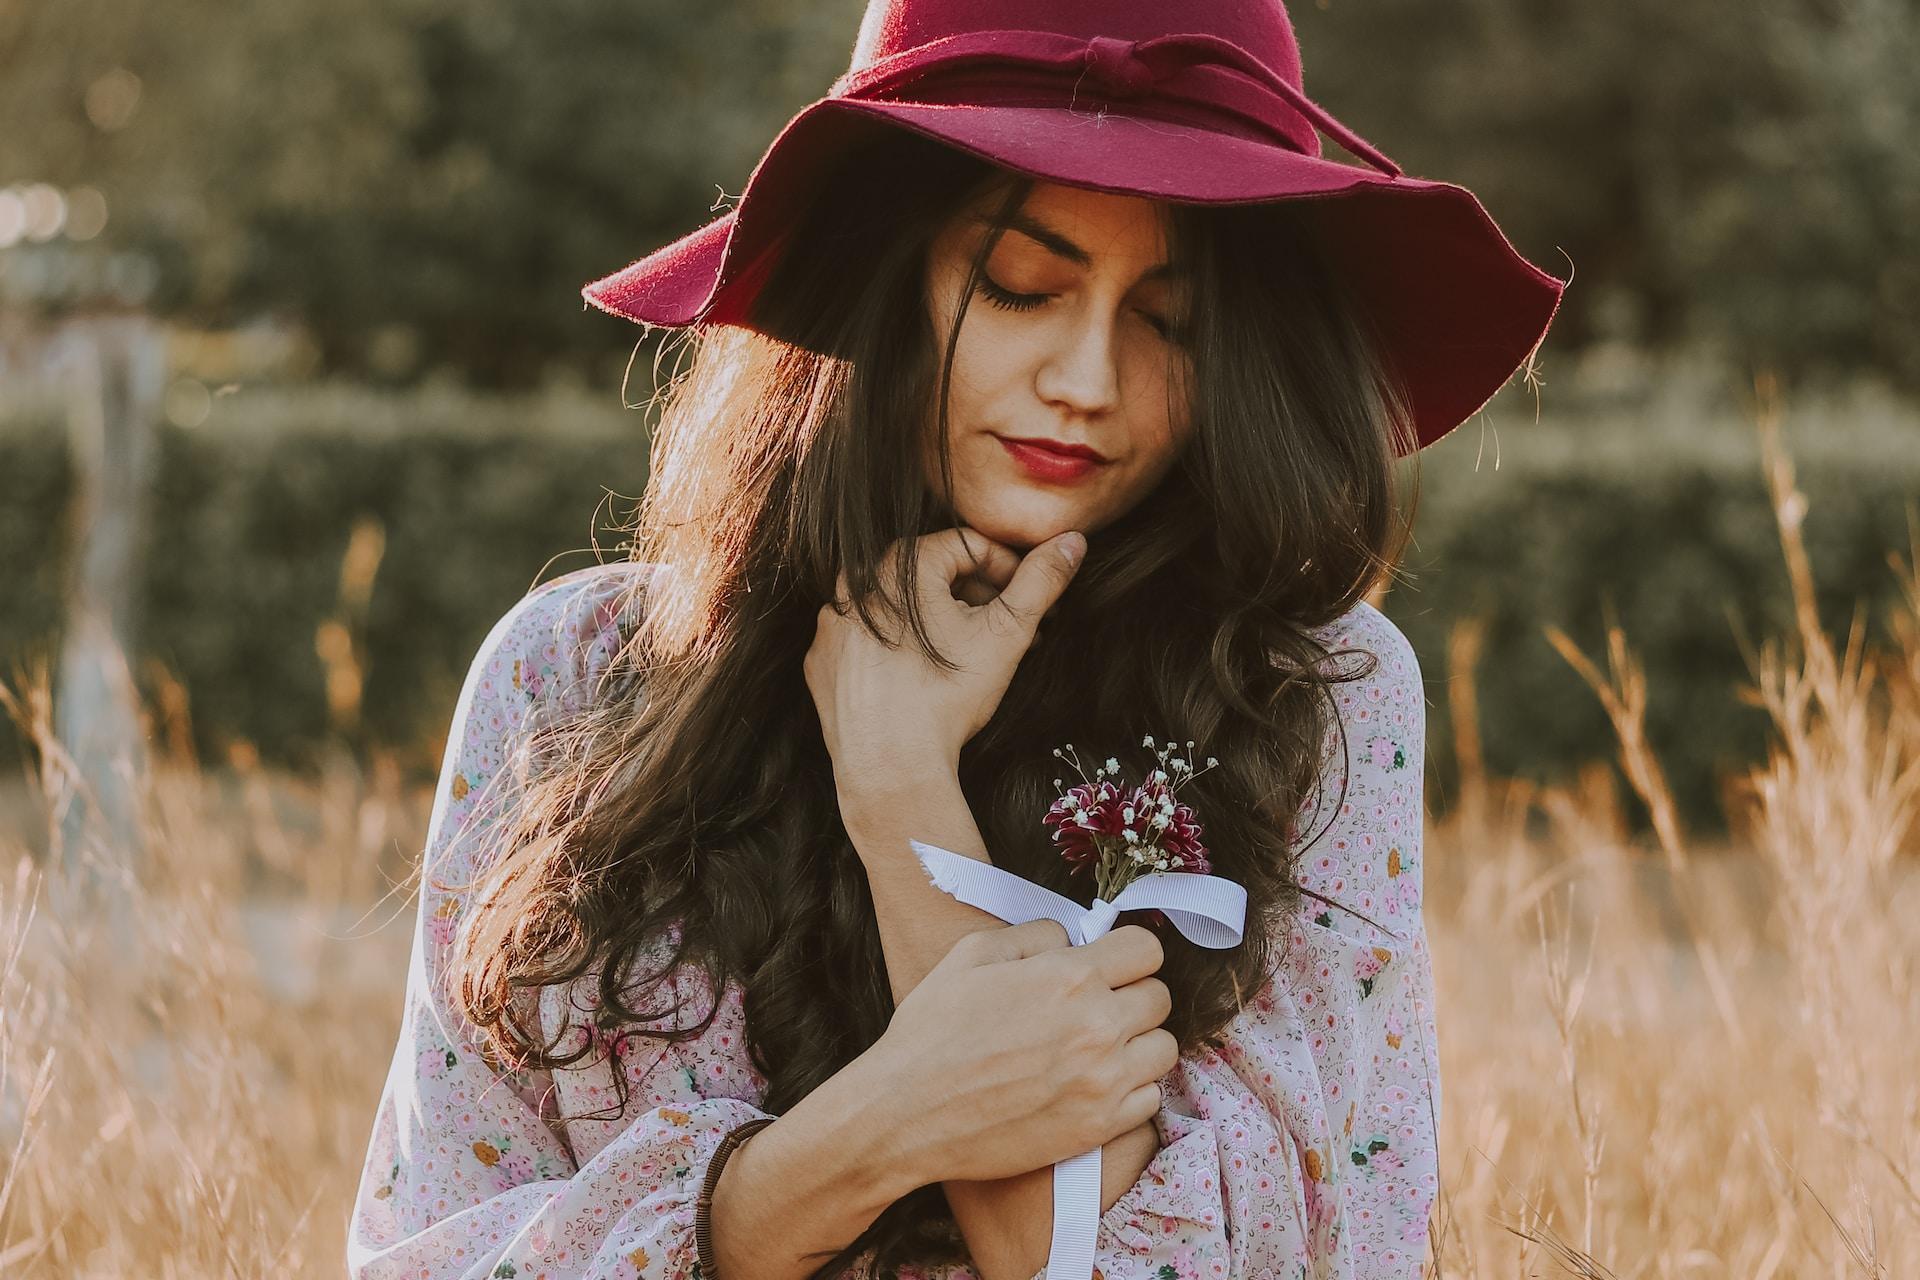 woman wearing brown floral long-sleeved dress